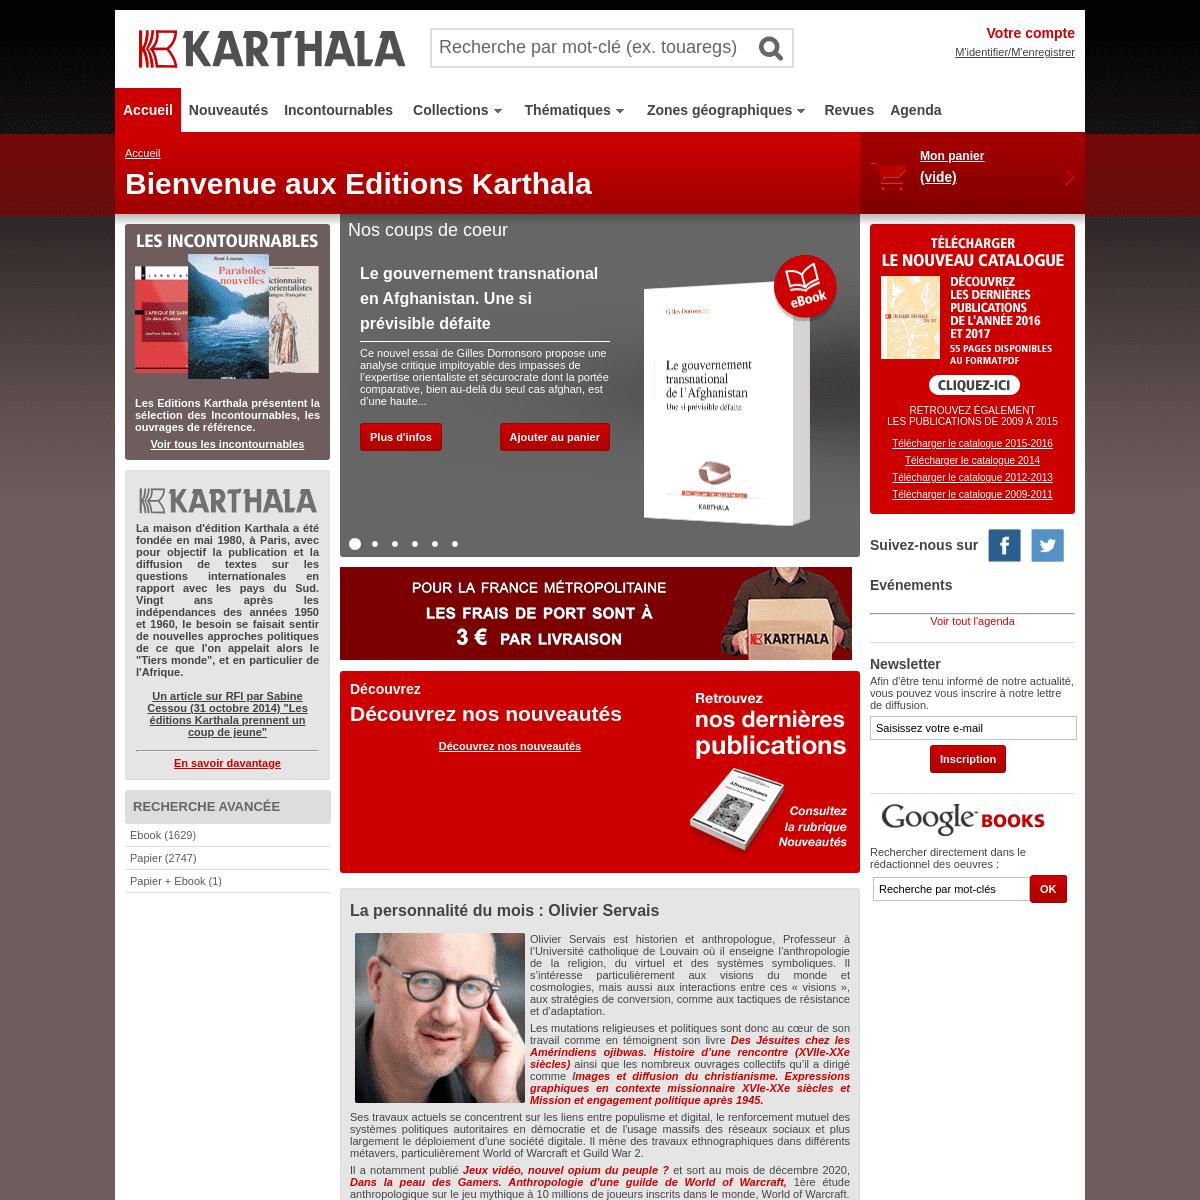 A complete backup of https://karthala.com